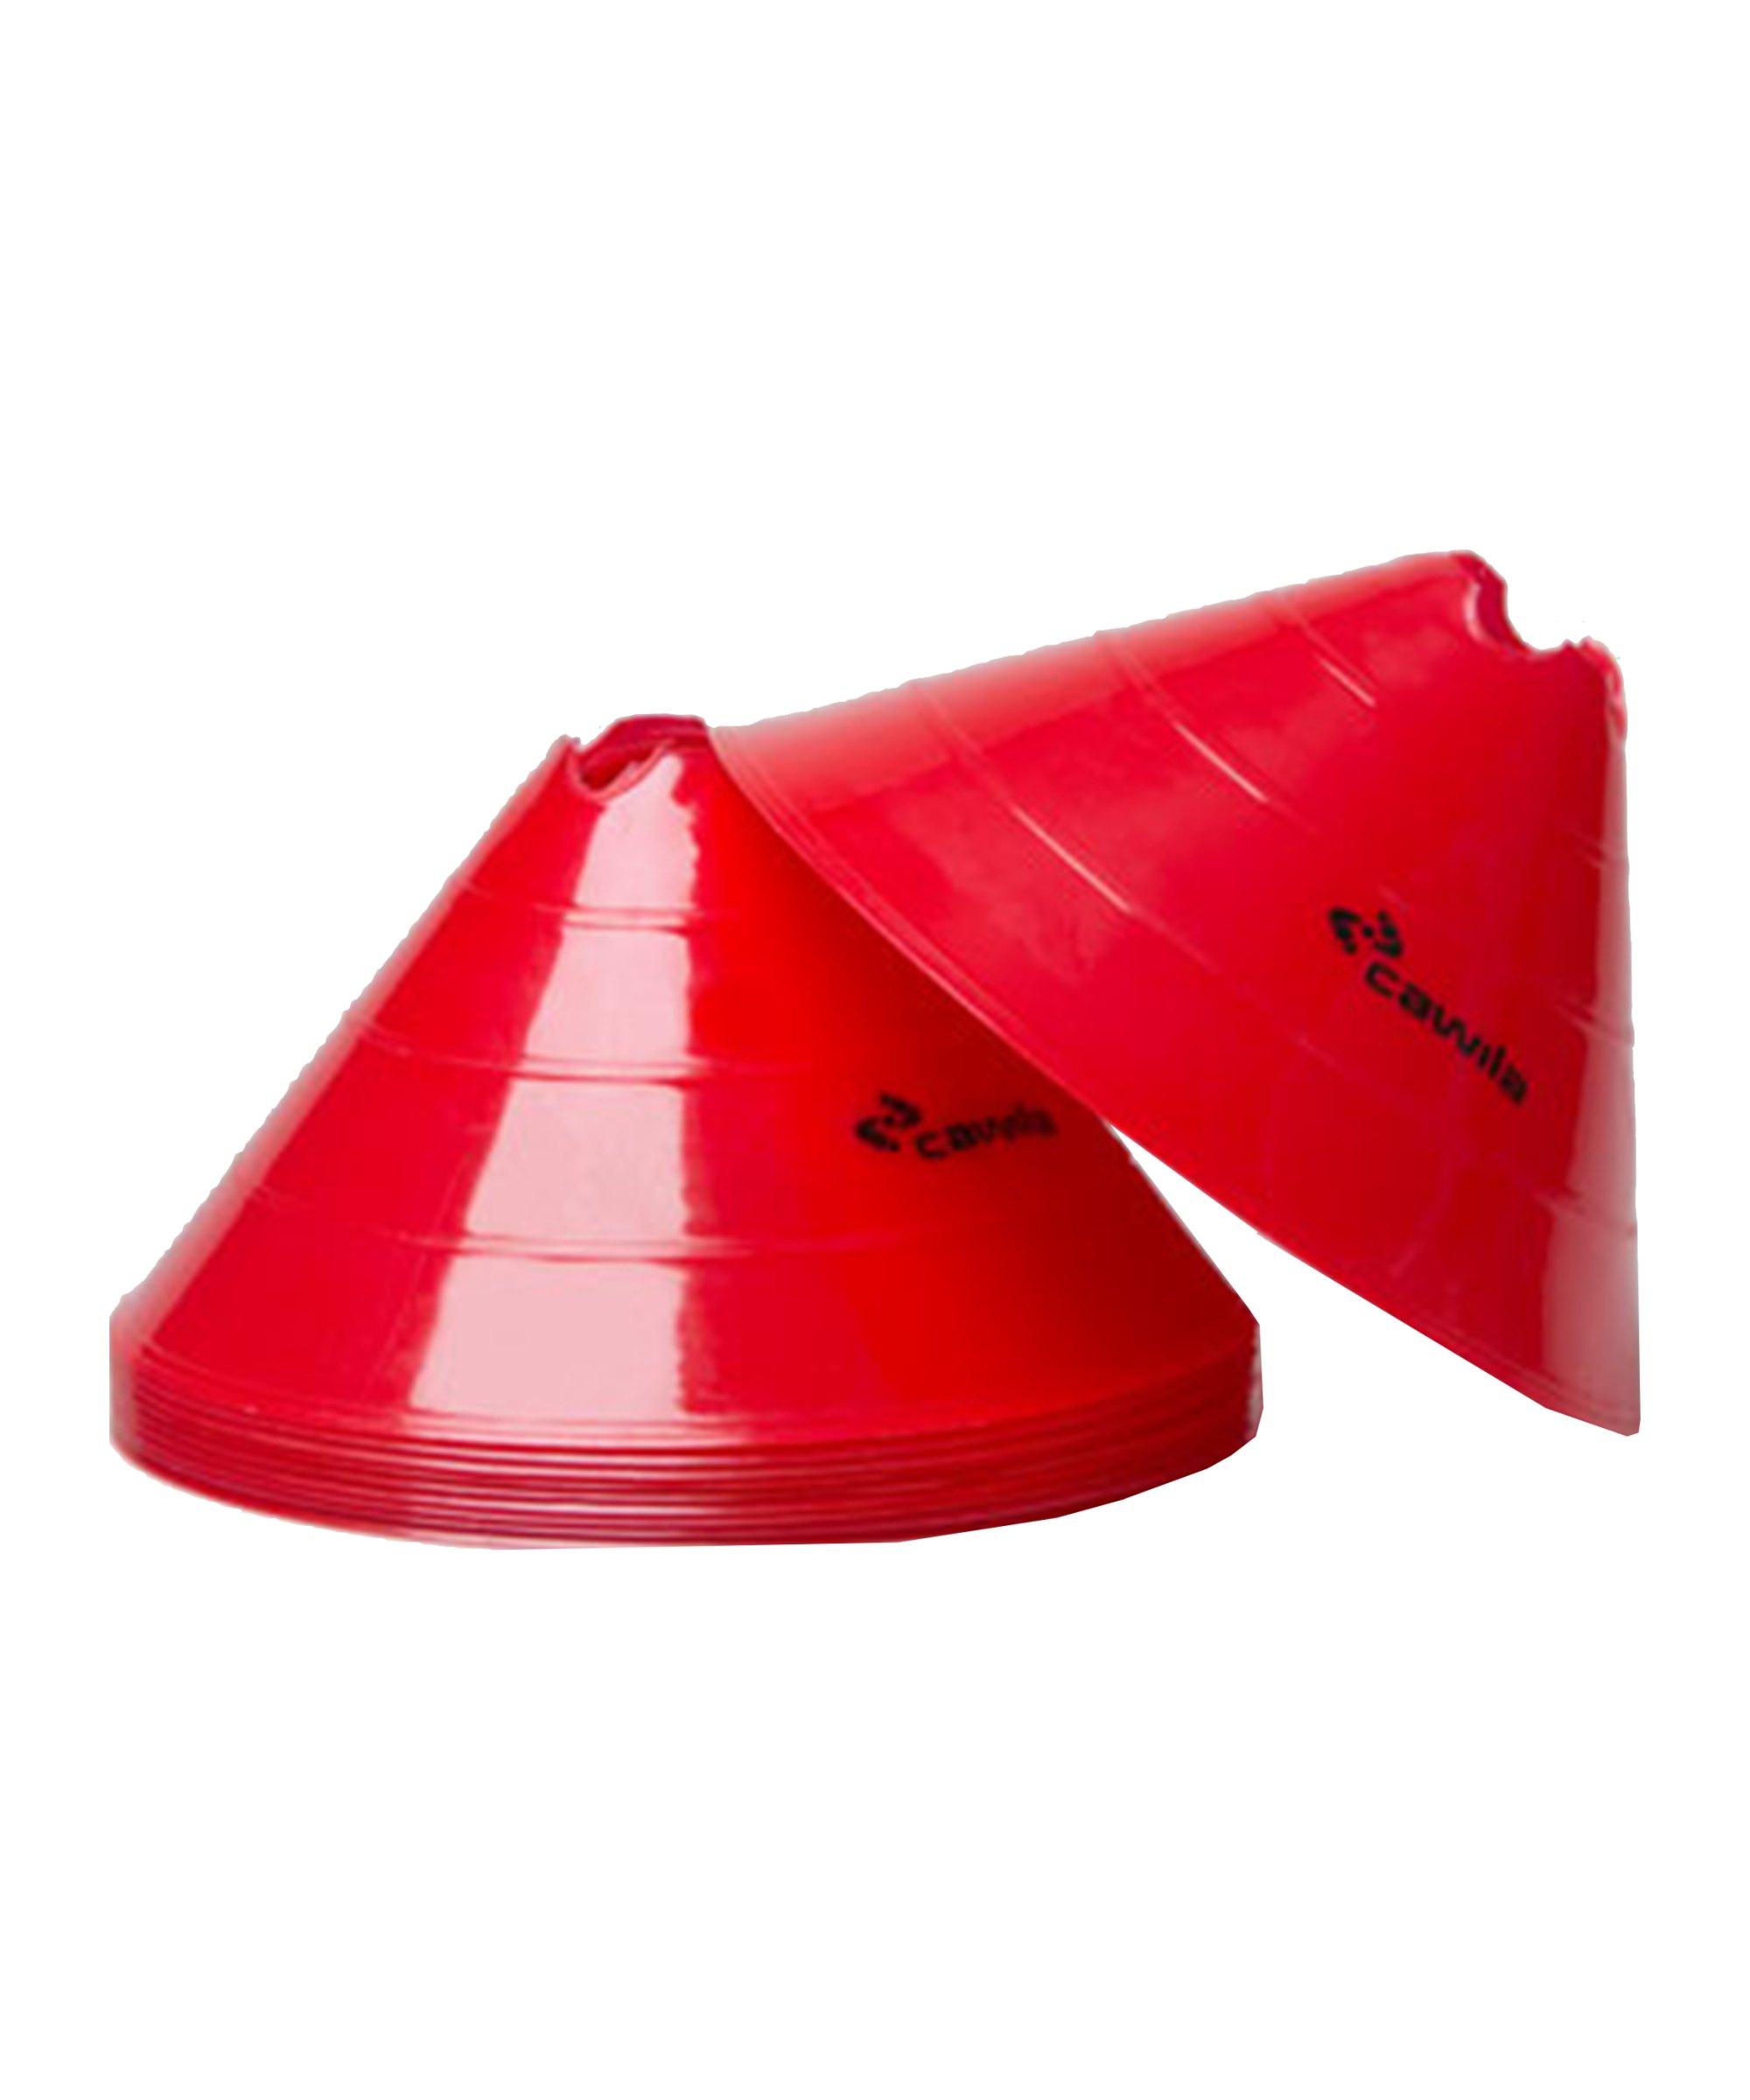 Cawila Markier.Scheiben L 10er d30cm 15cm Rot - rot